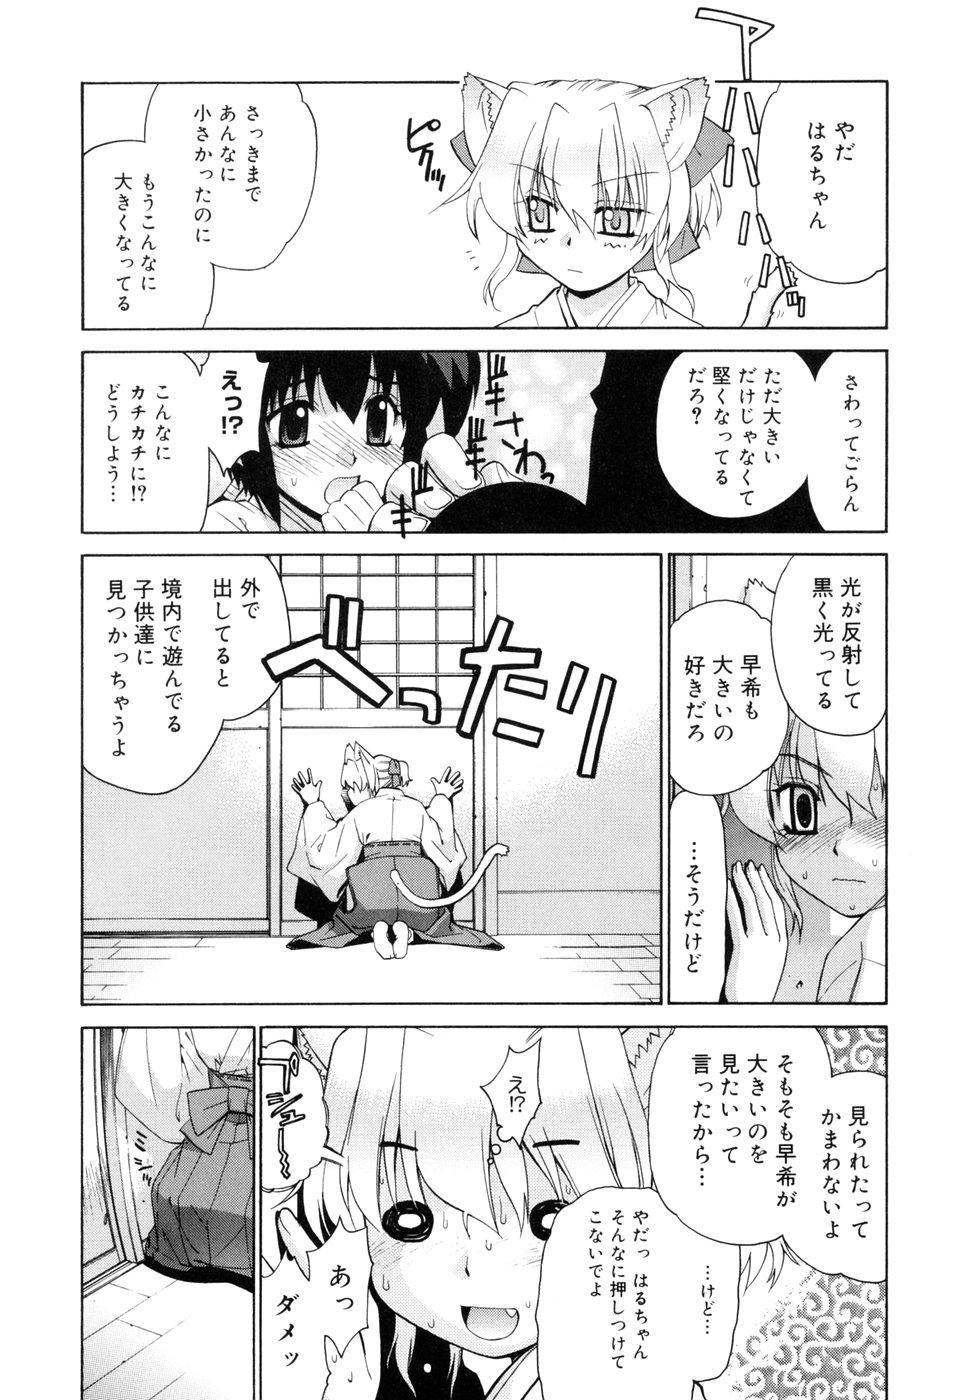 [Yaya Hinata] Tonari no Miko-san wa Minna Warau - The next shrine maidens smile in everyone. 153